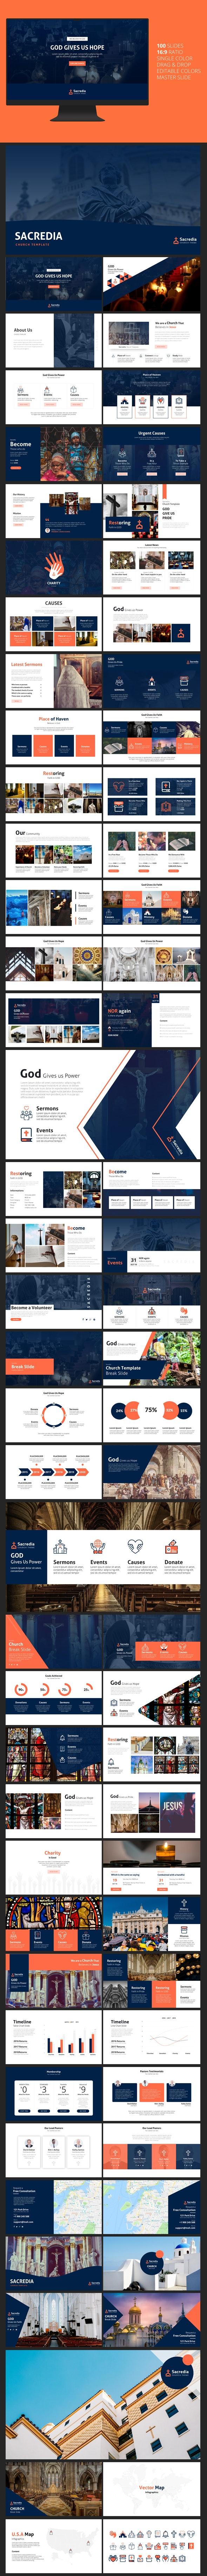 Sacredia - Church PowerPoint Template - PowerPoint Templates Presentation Templates